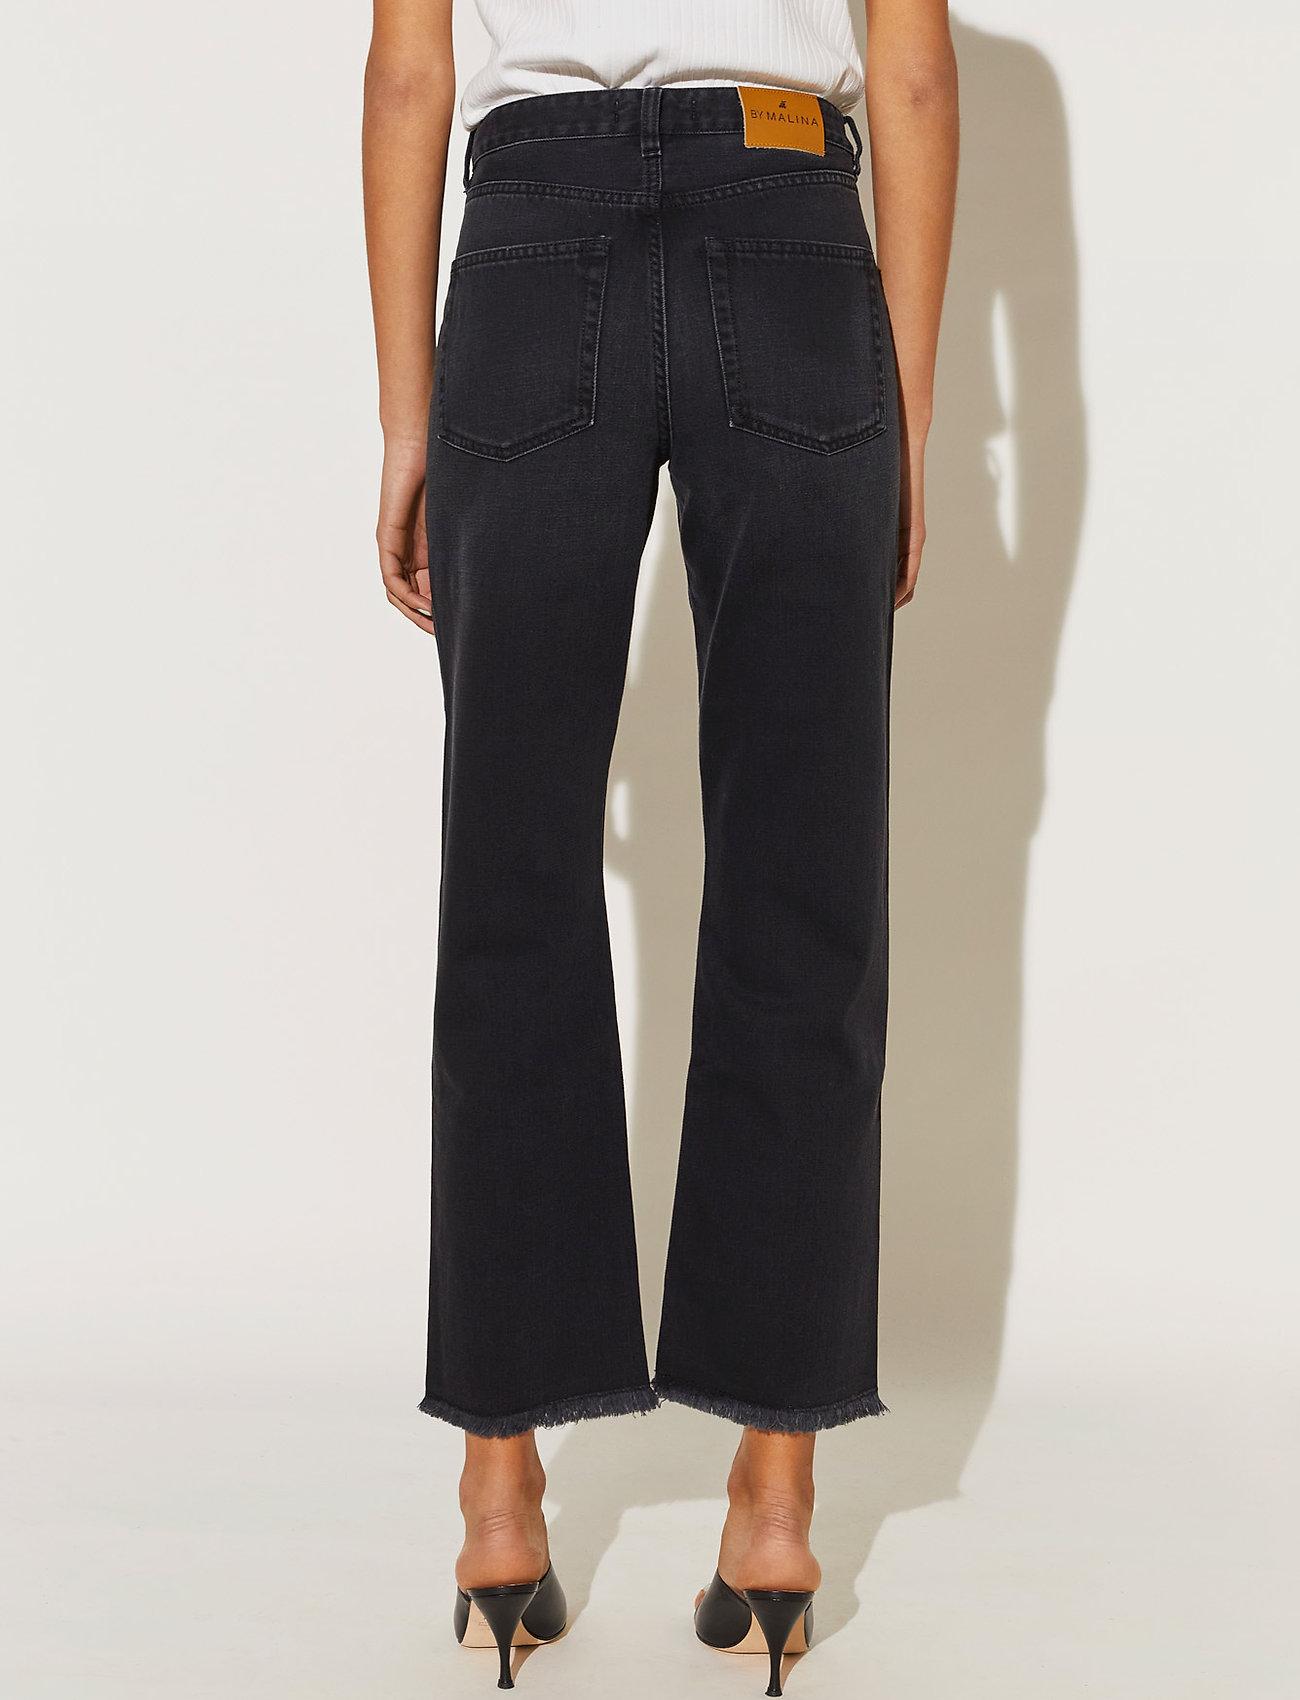 By Malina - Alexa jeans - straight regular - black - 4